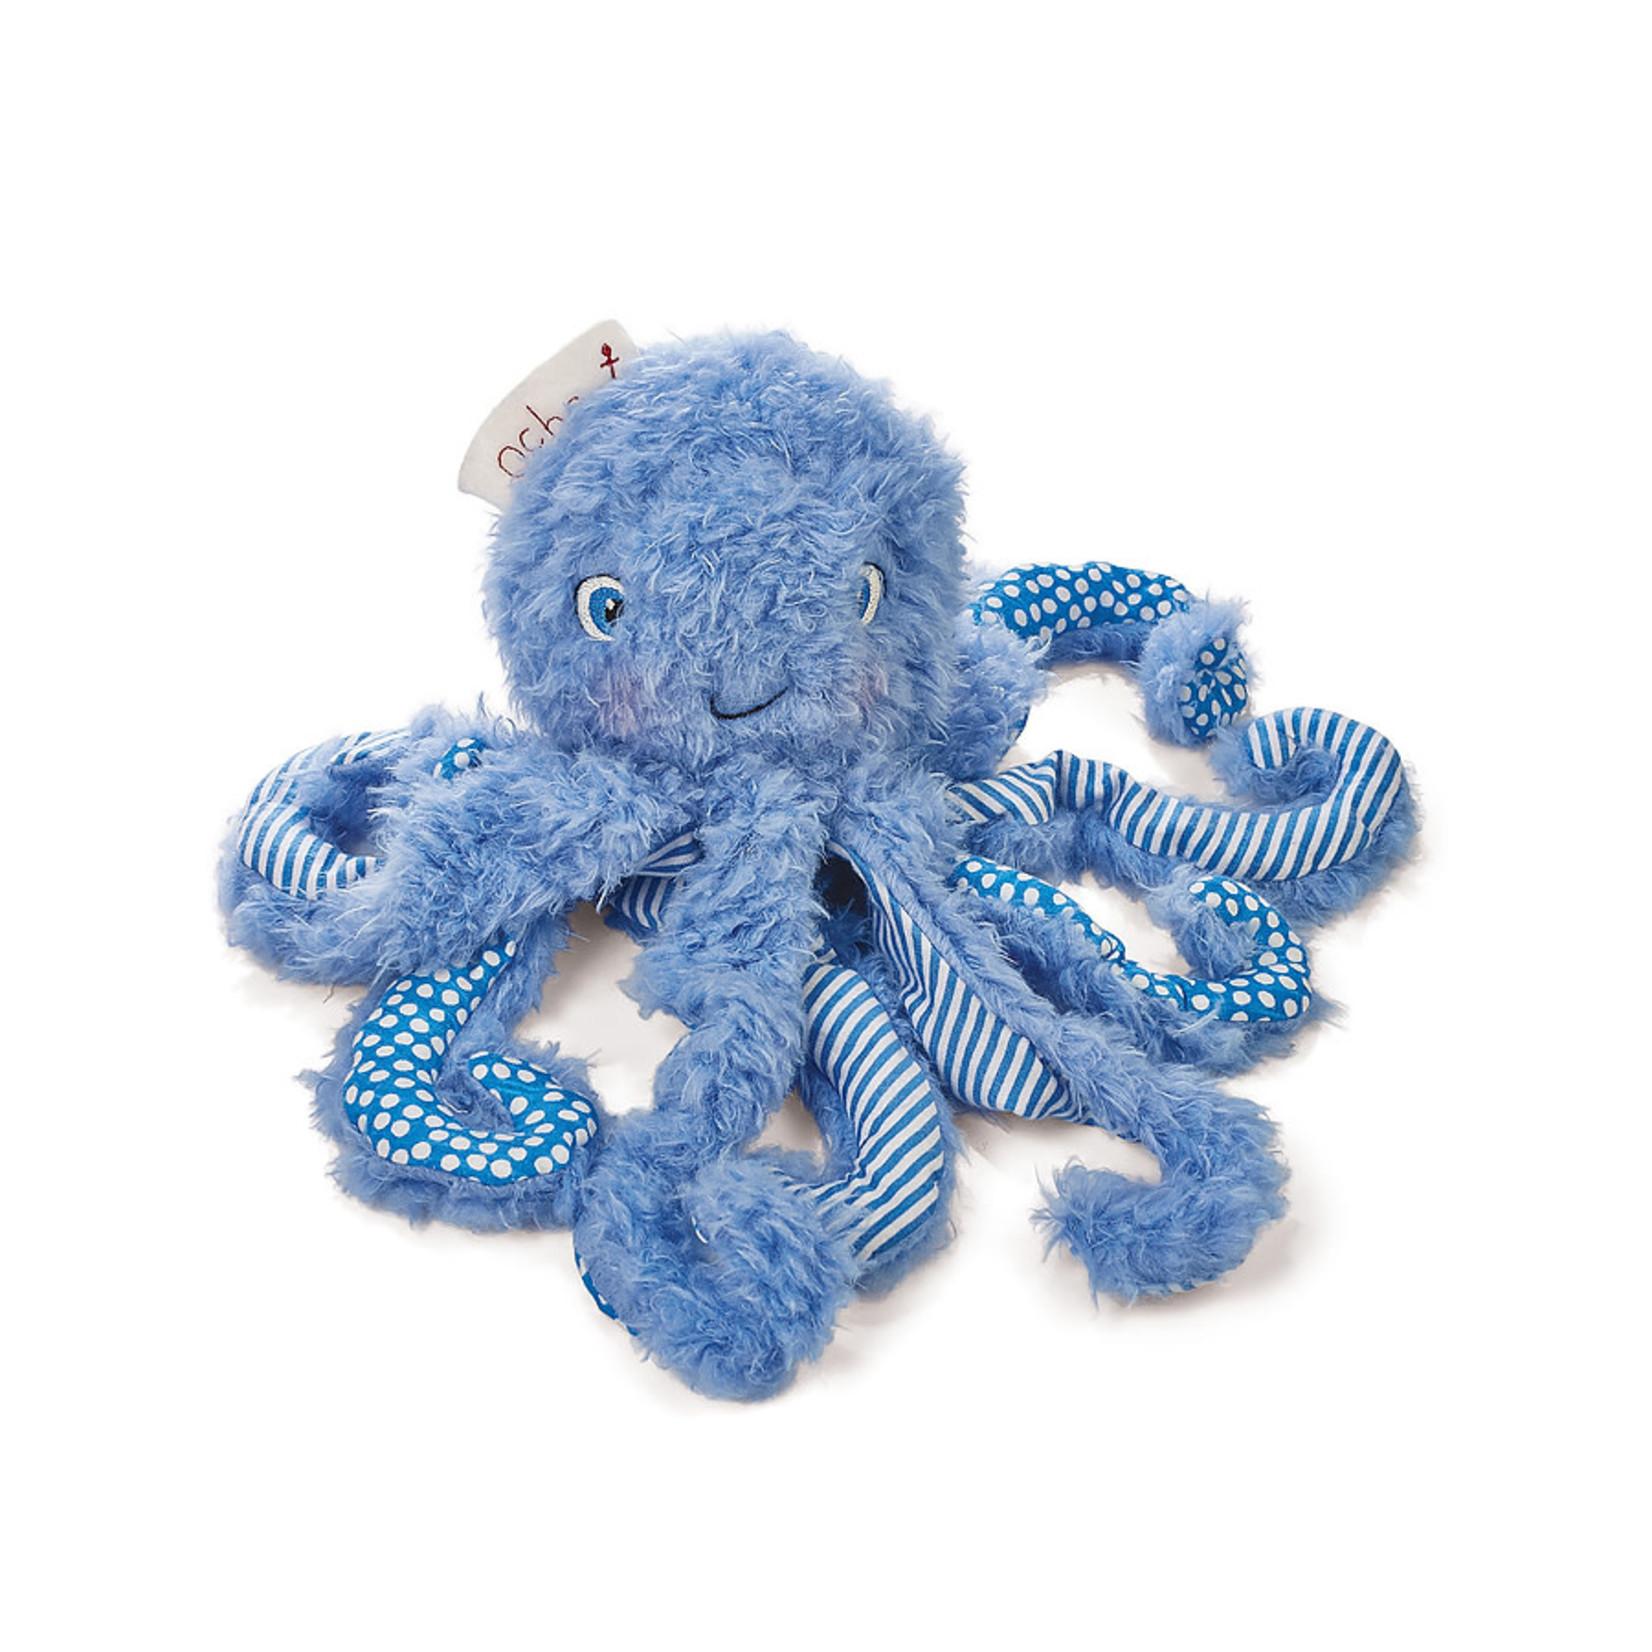 Bunnies By the Bay Ocho Octopus Plush Doll